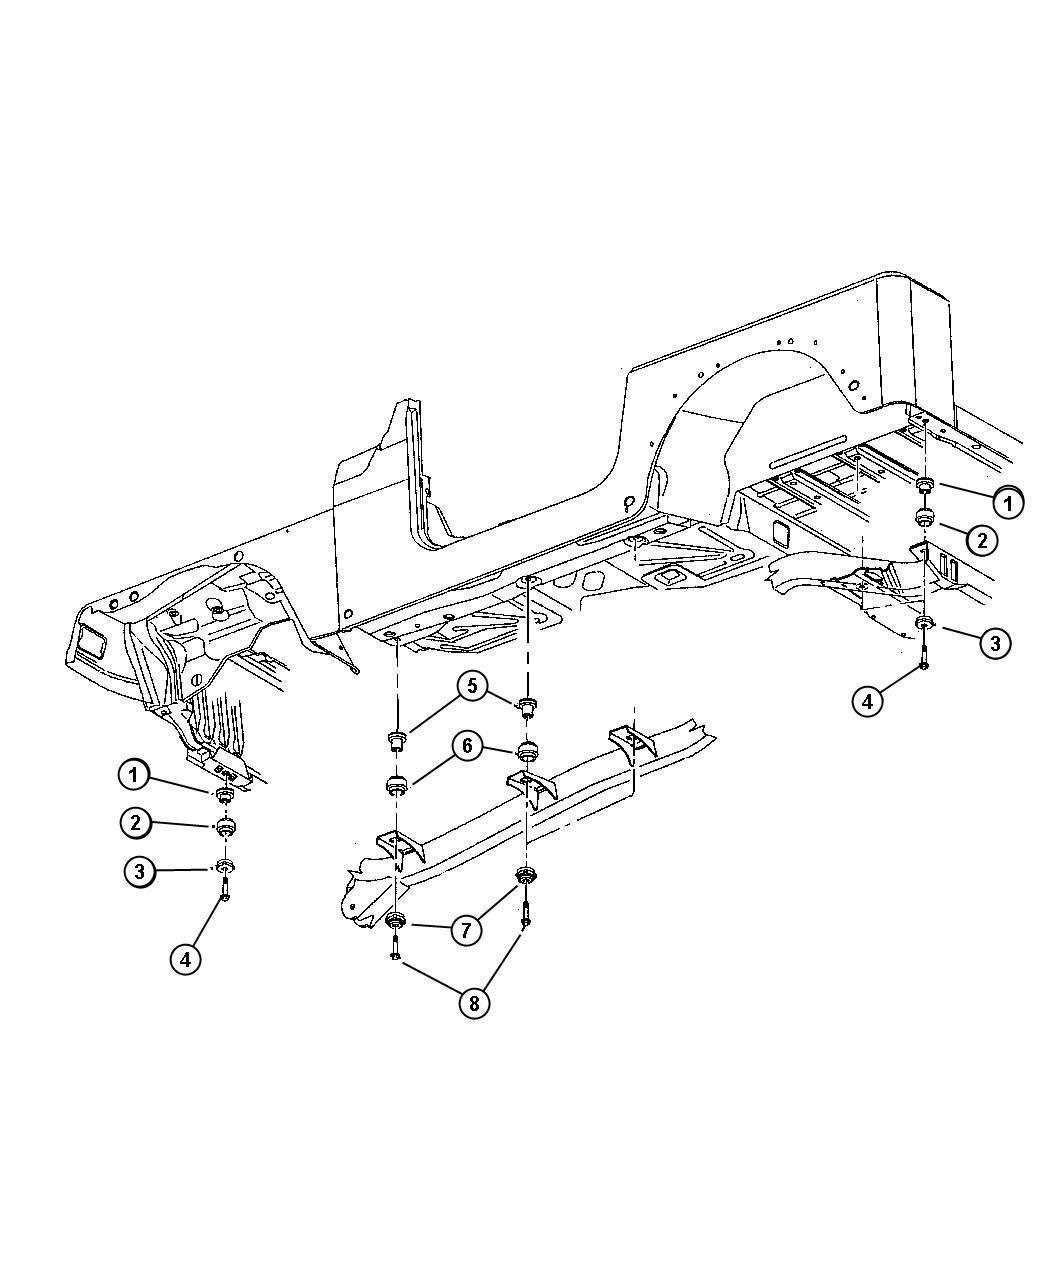 Jeep Wrangler Insulator. Body hold down. Hardwarebody